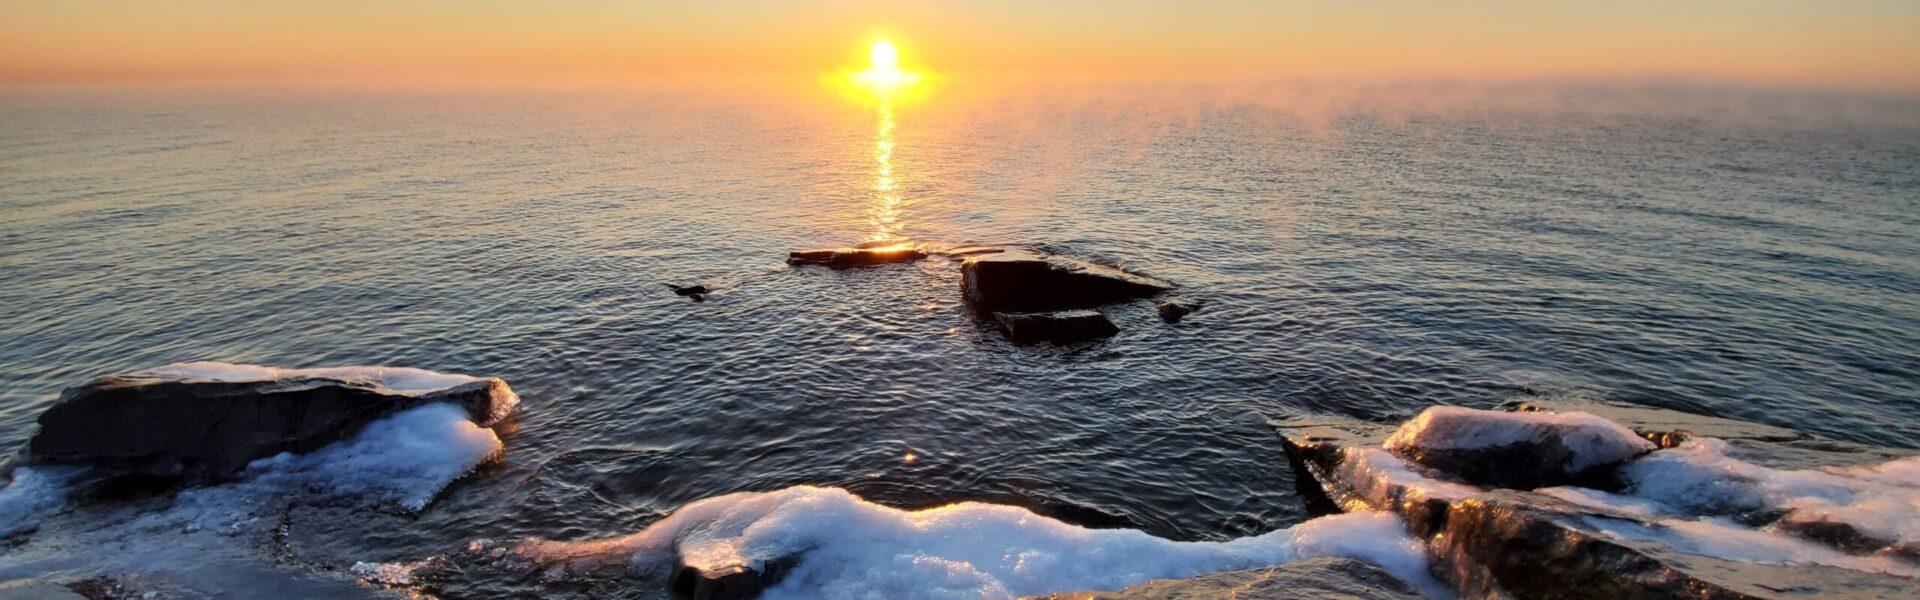 sunrise prayer